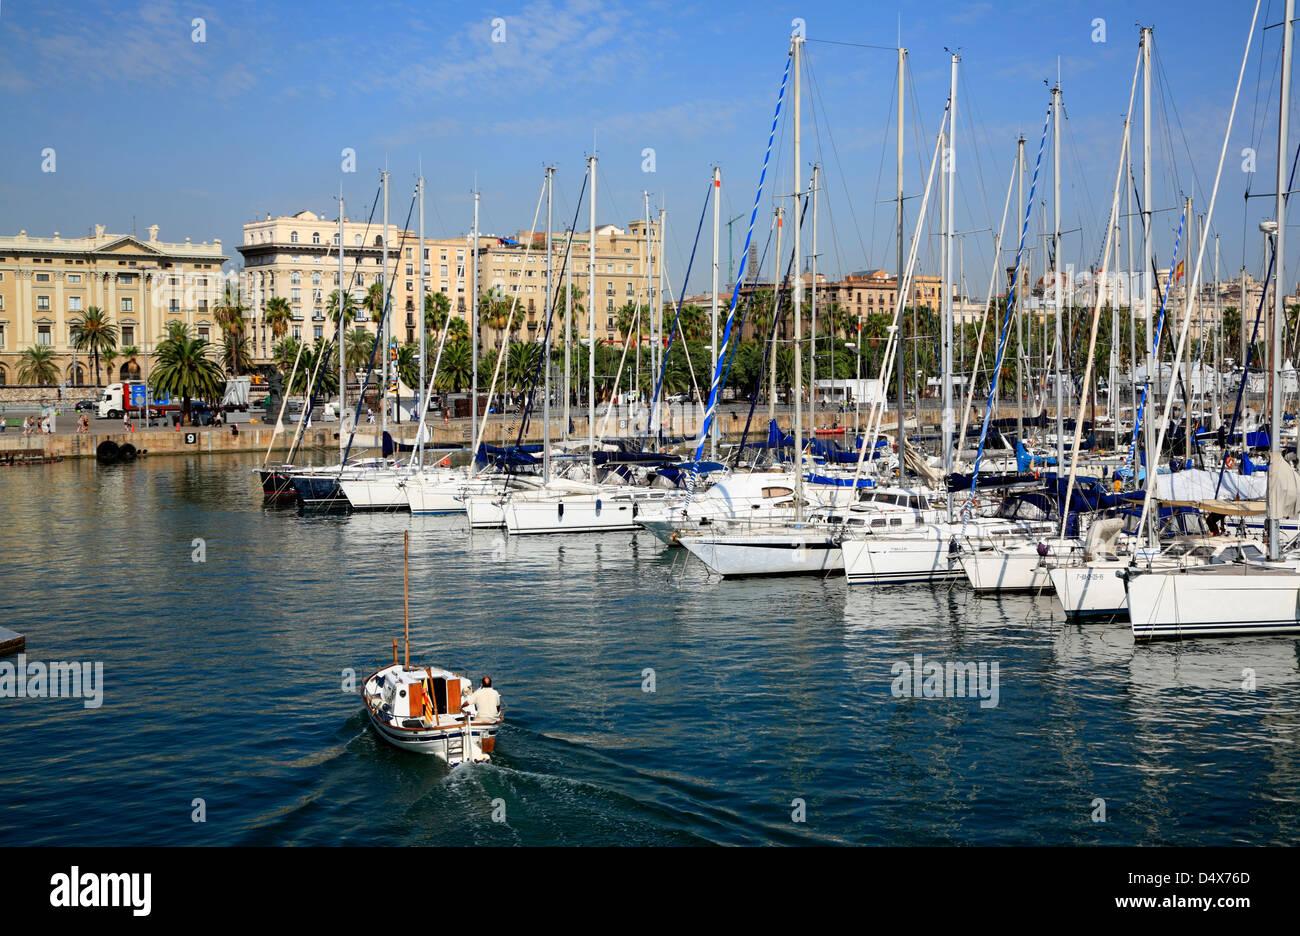 Sailboats, Port Vell harbor, Barcelona, Spain - Stock Image